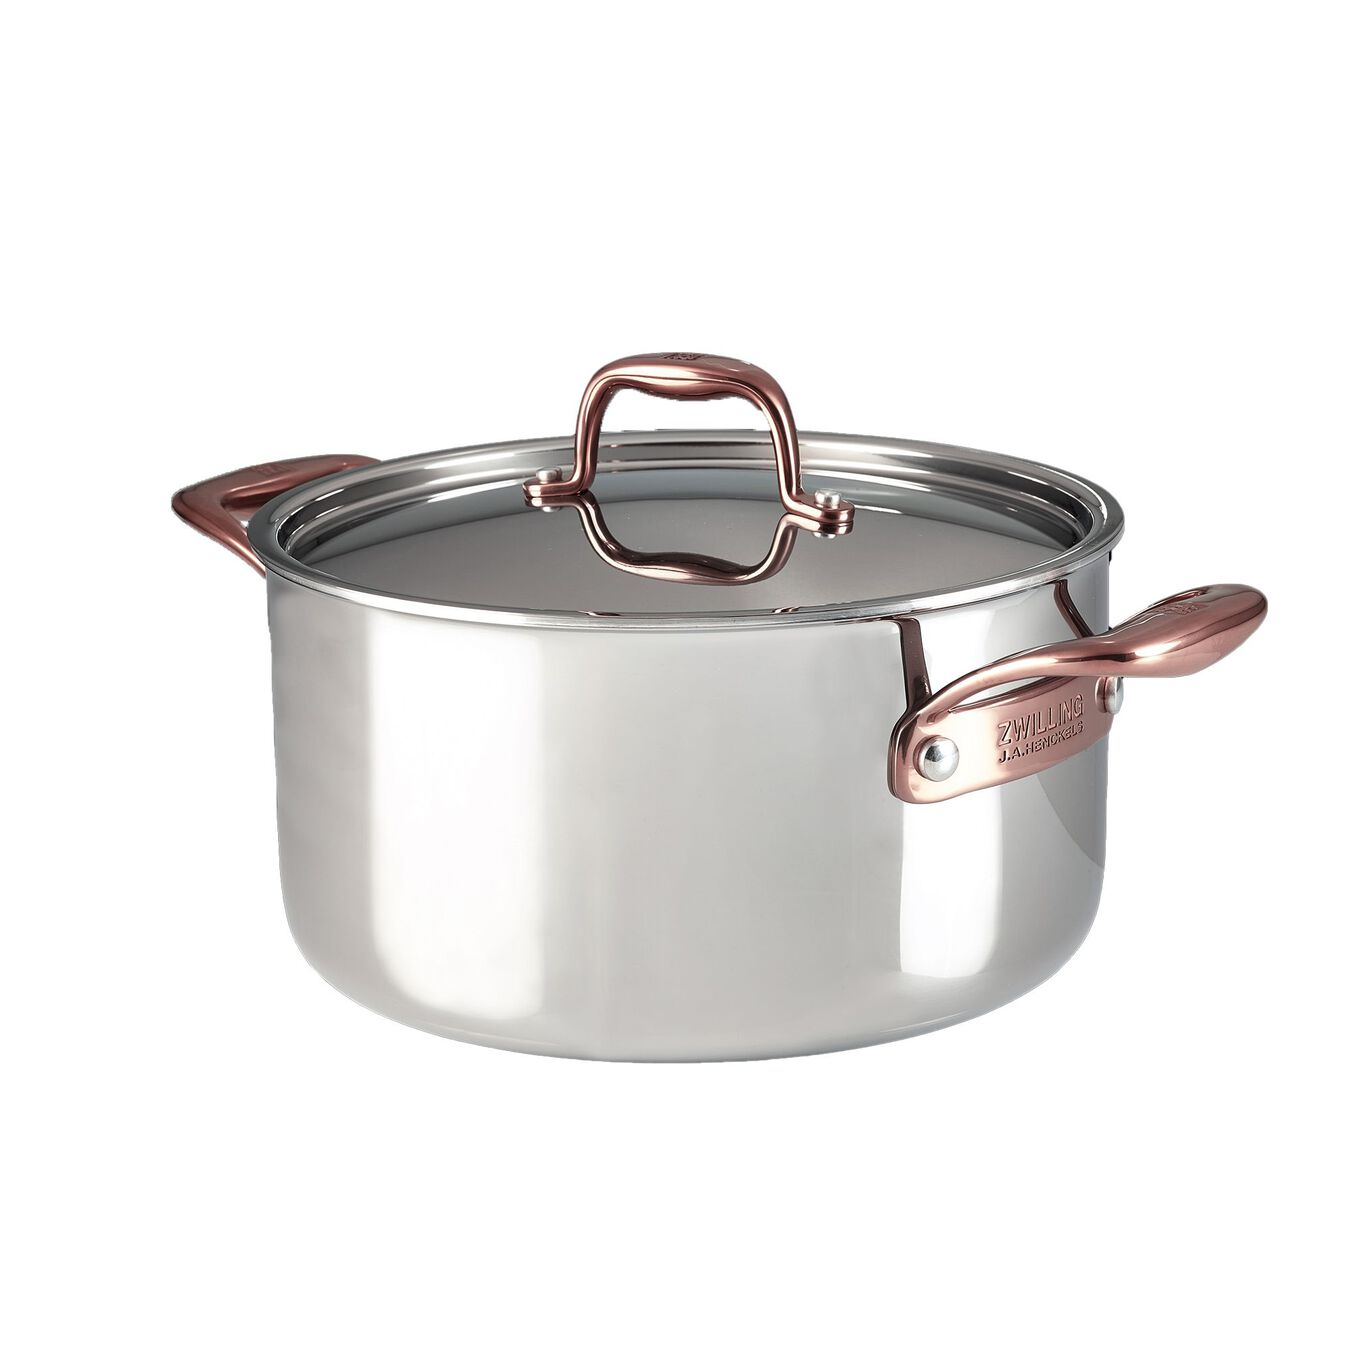 10 Piece Cookware set,,large 6